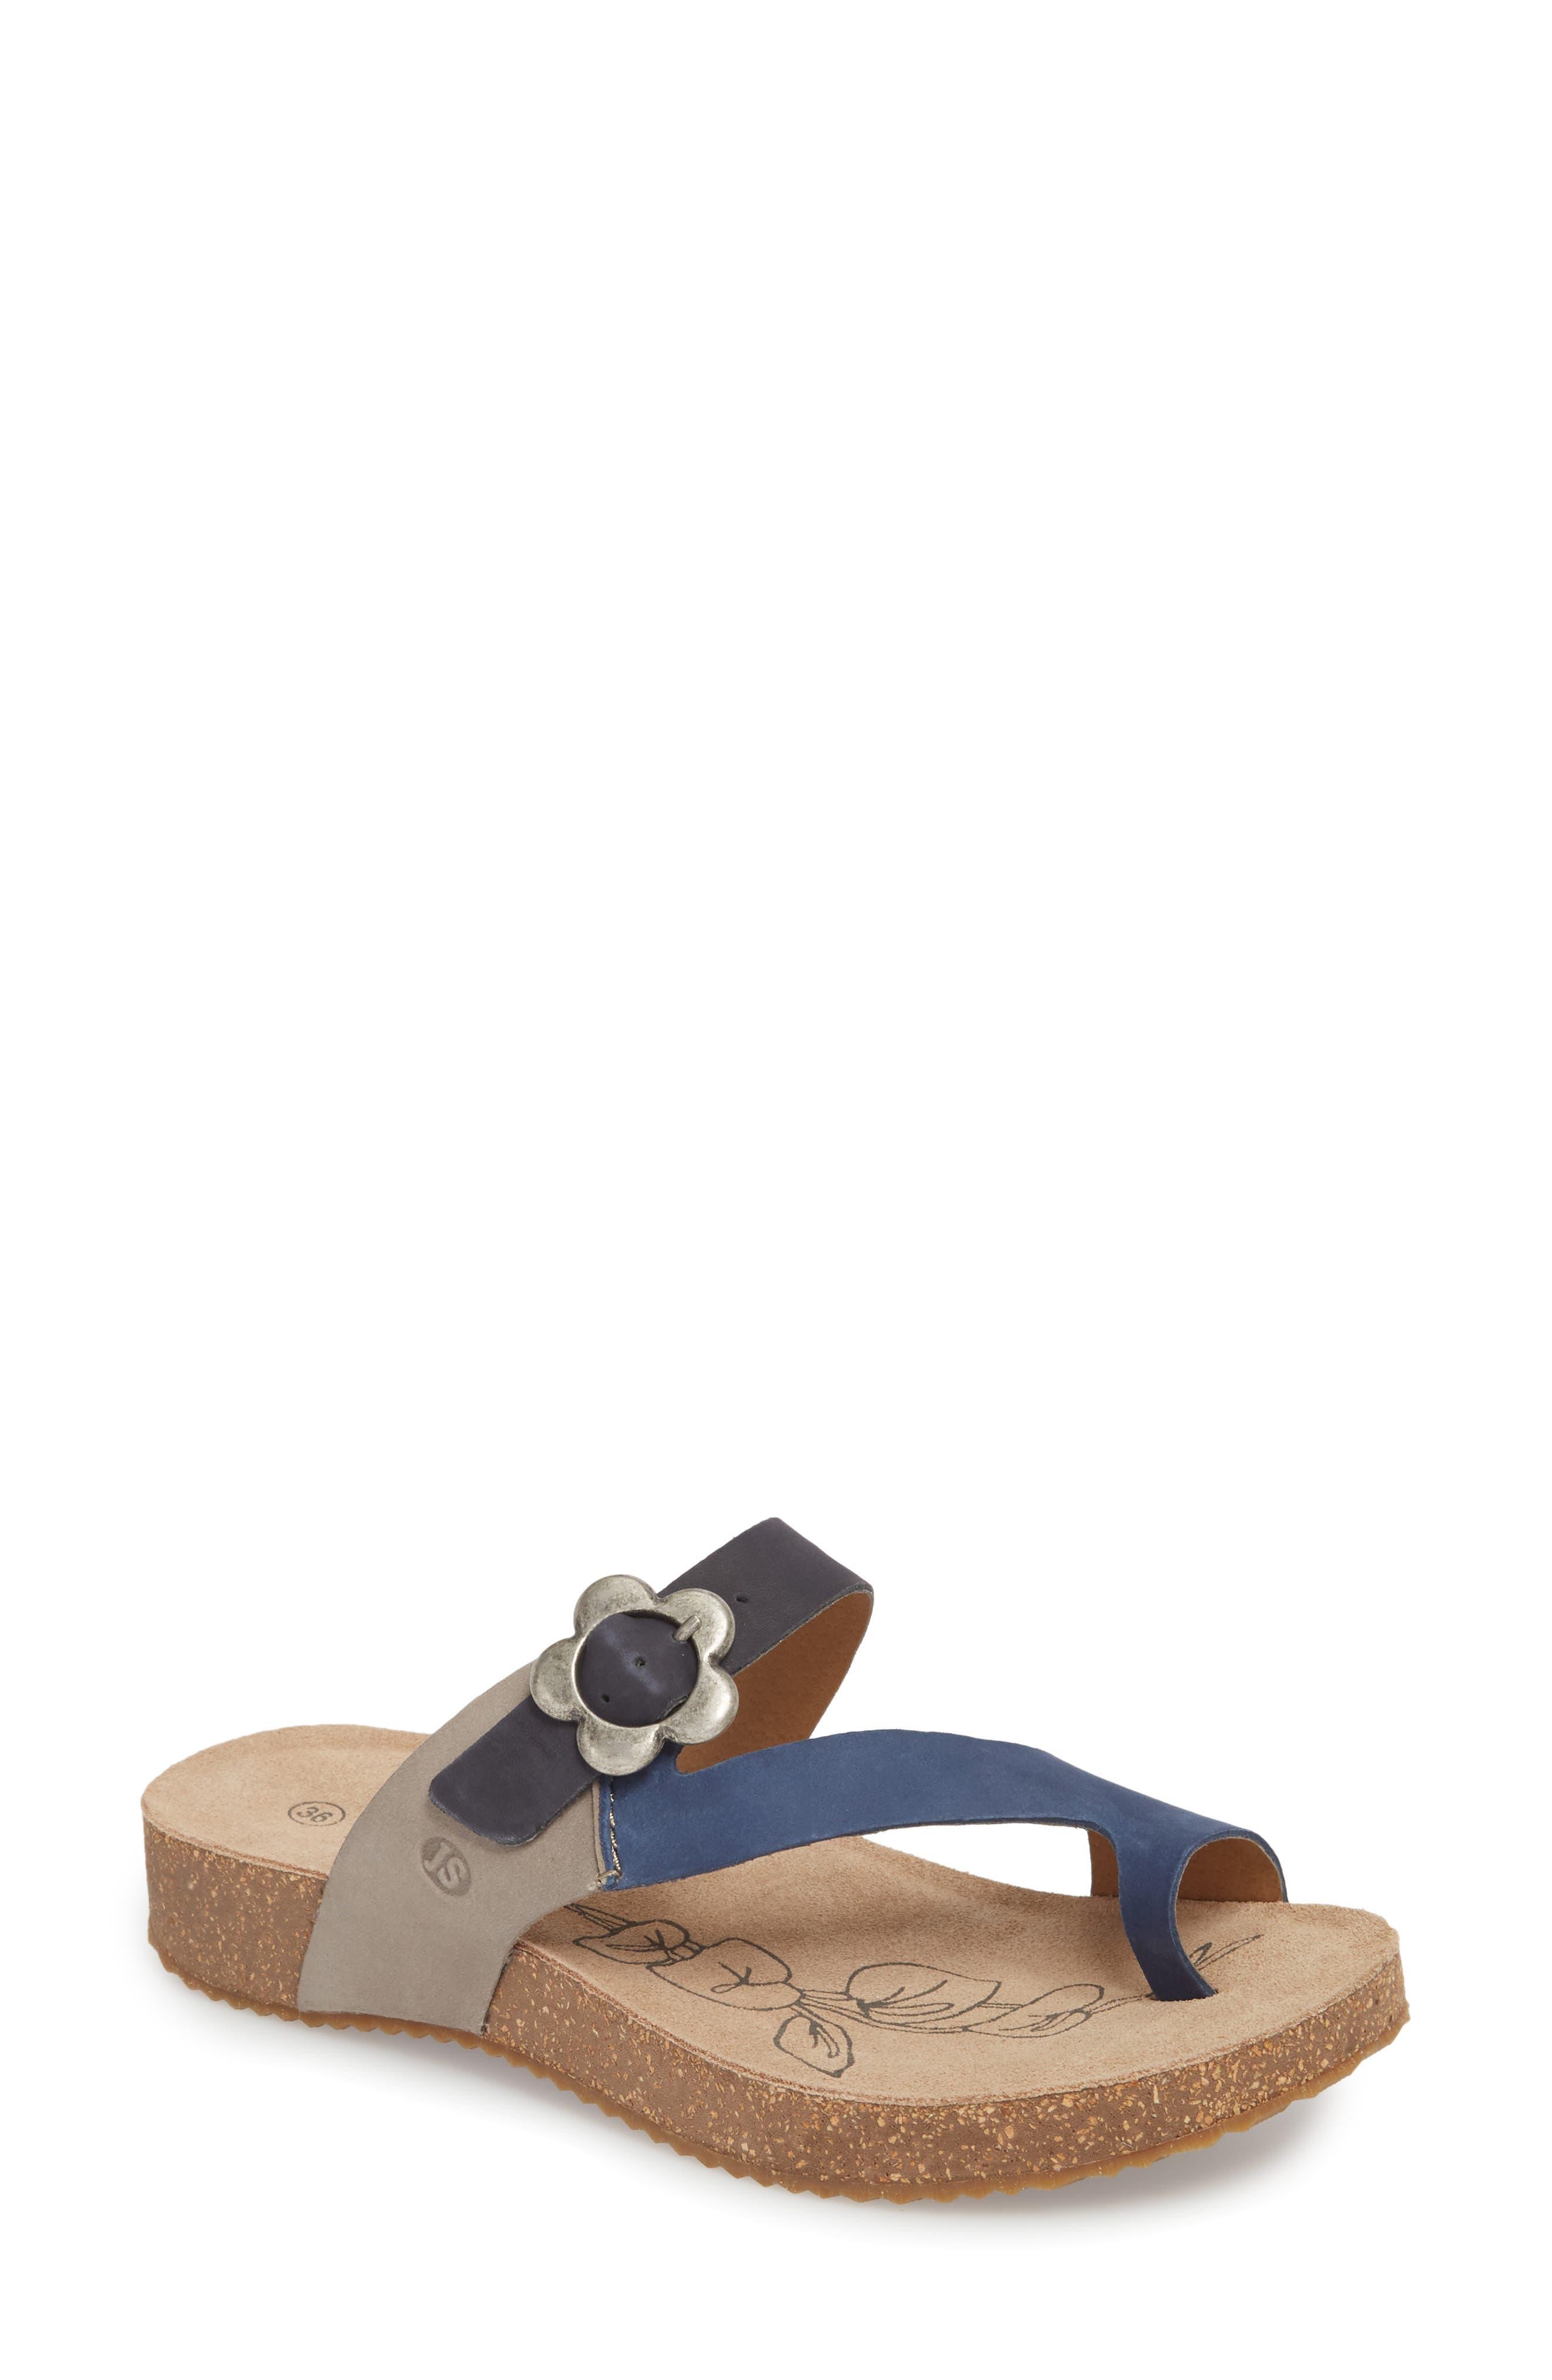 Tonga 23 Sandal,                         Main,                         color, Blue Multi Leather